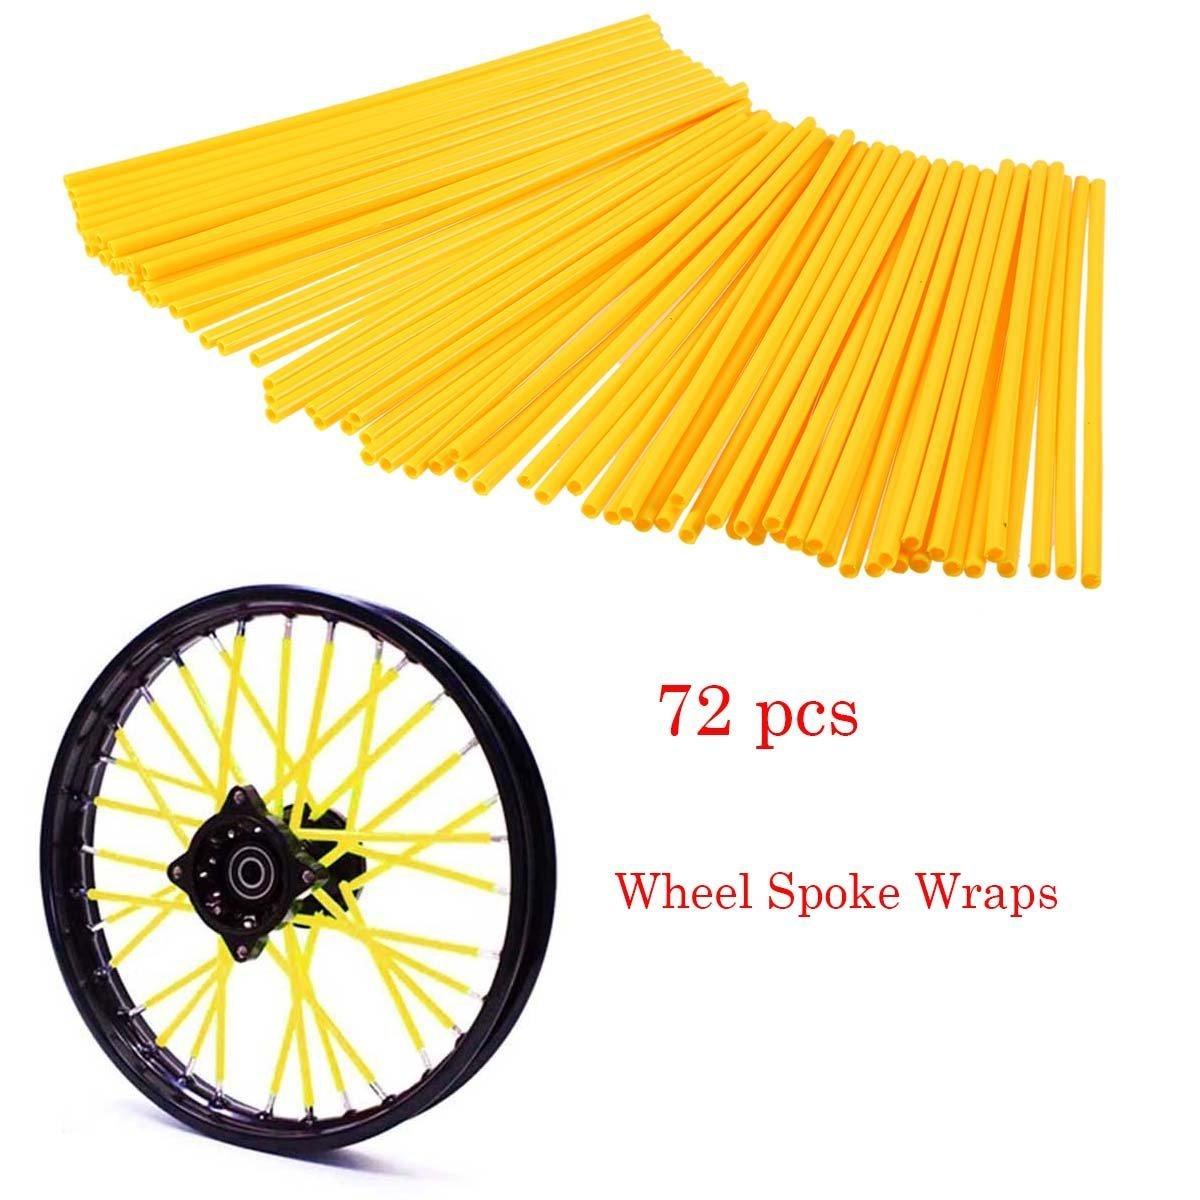 POSSBAY 72pcs Wheel Spoke Skins Wraps Coat Covers for Motorcycle Street Bike Bicycle